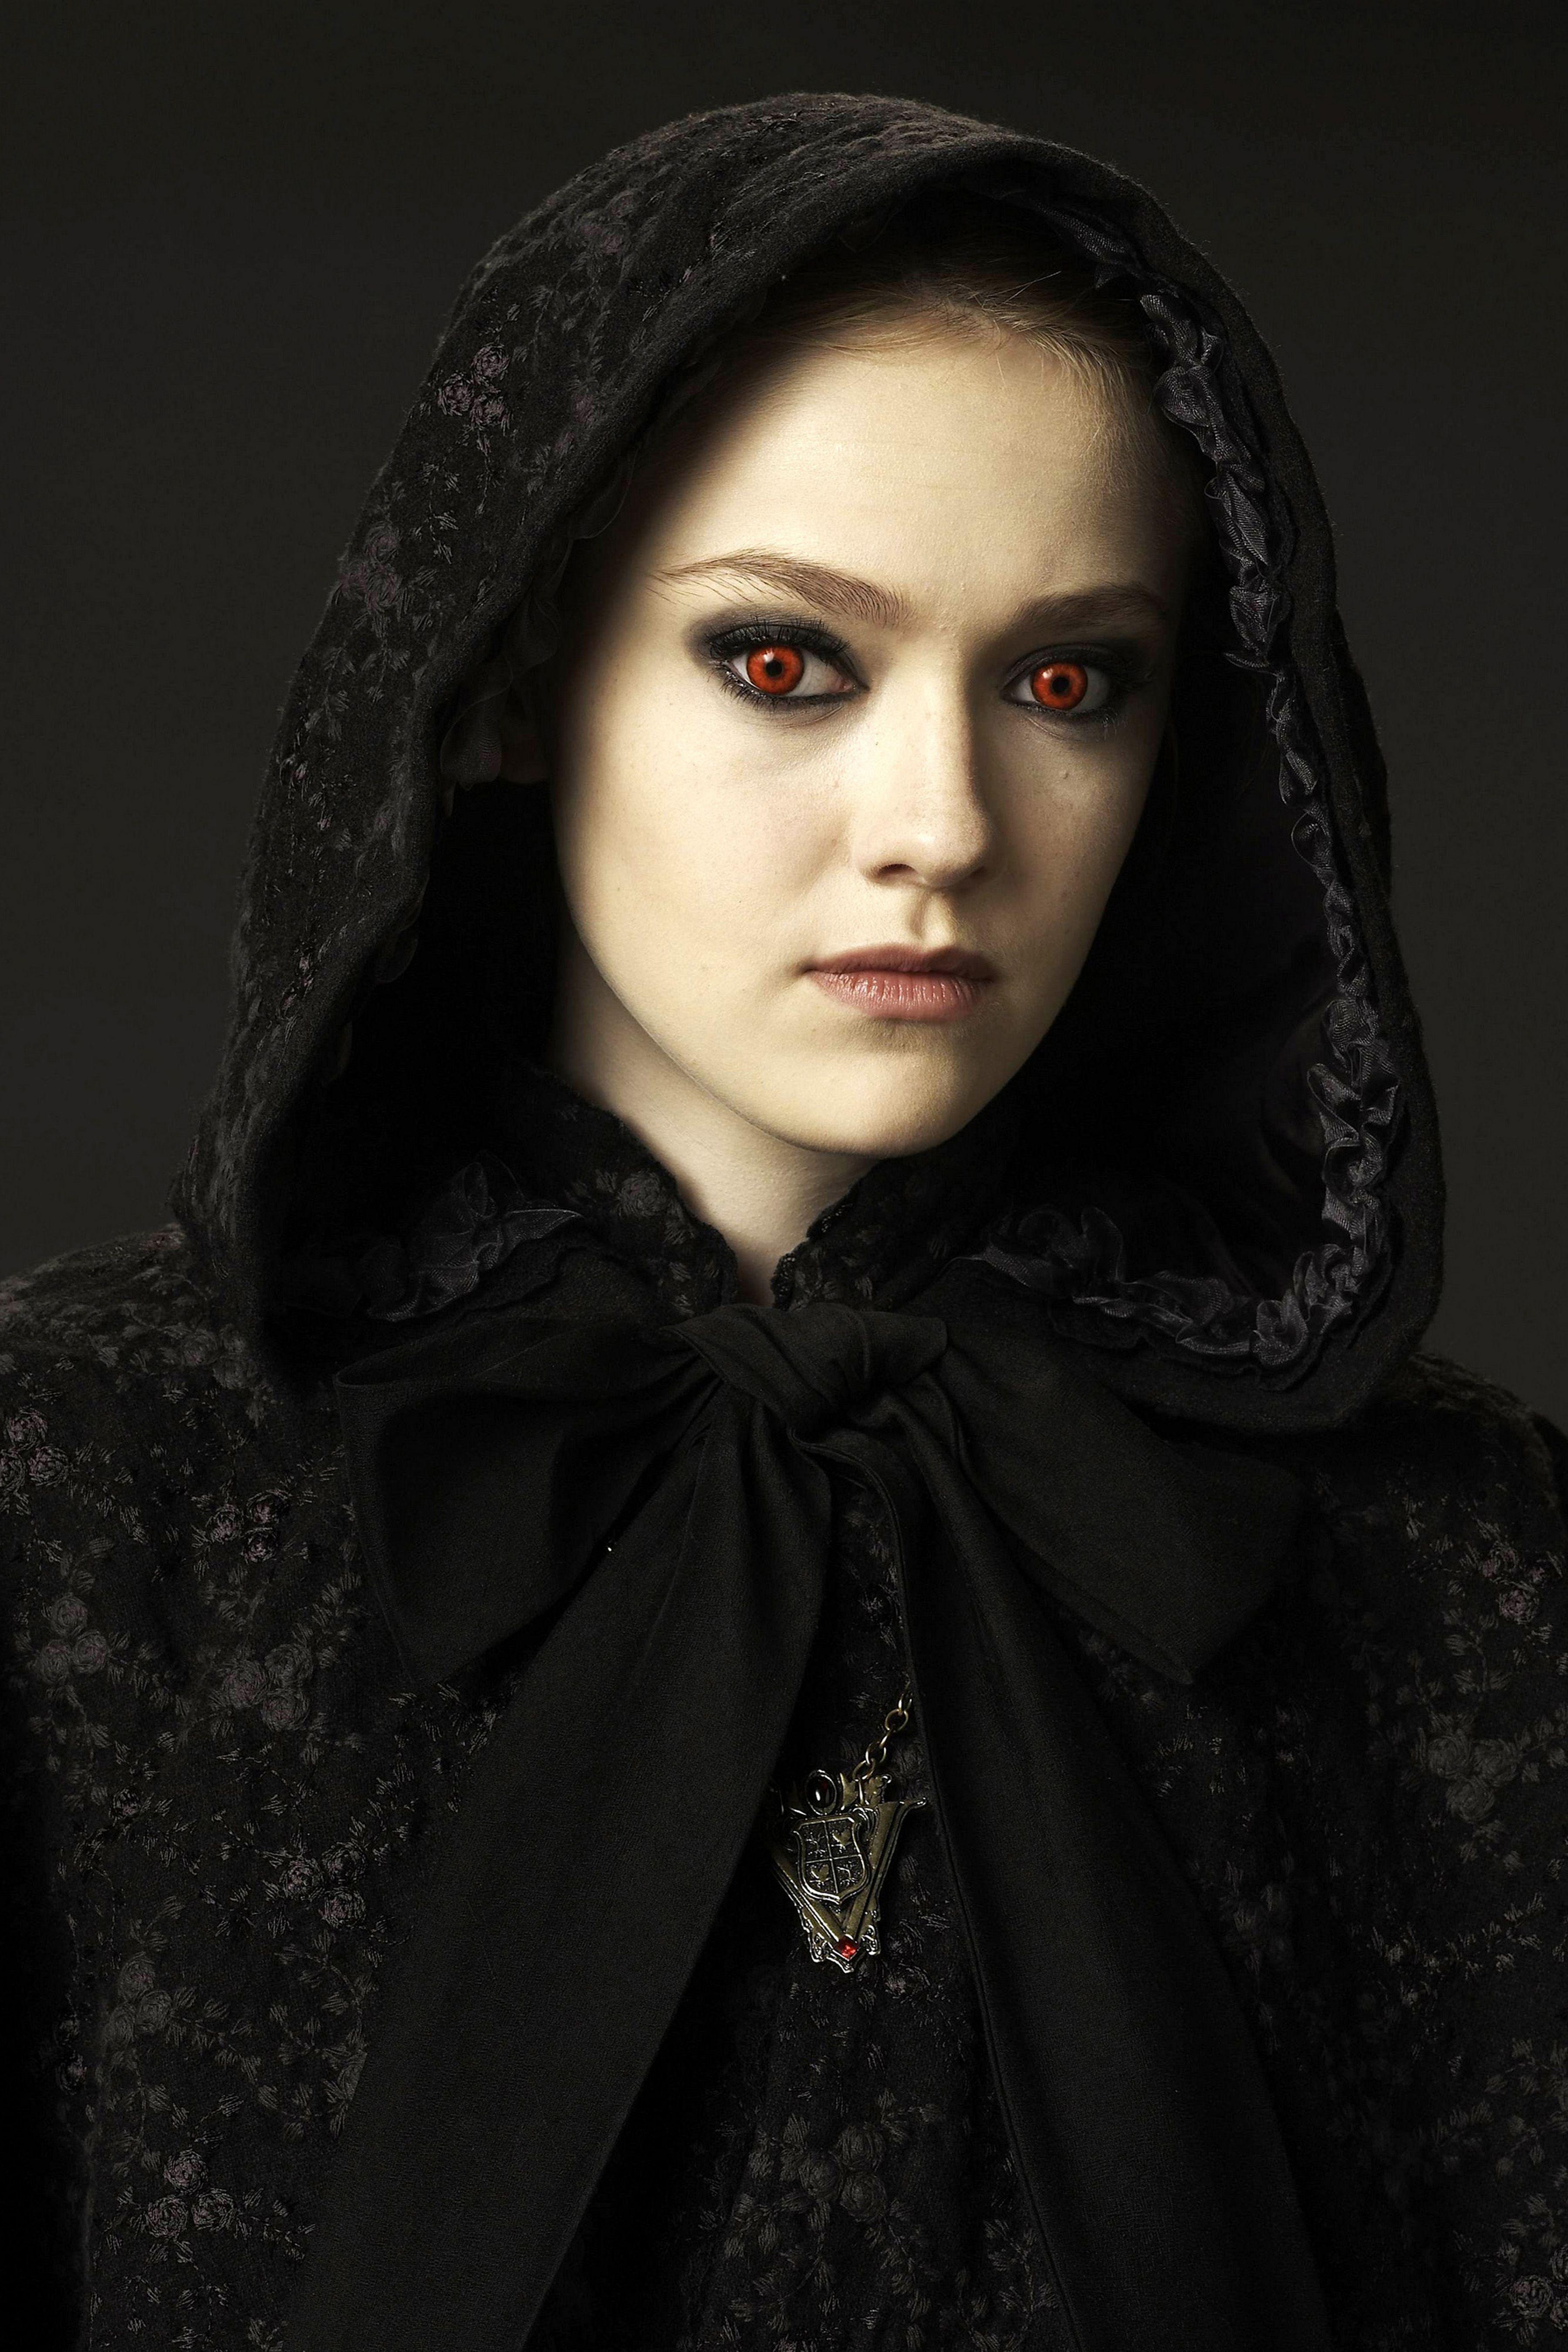 Image - Jane-volturi4-1024x768.jpg | Twilight Saga Wiki | Fandom ...